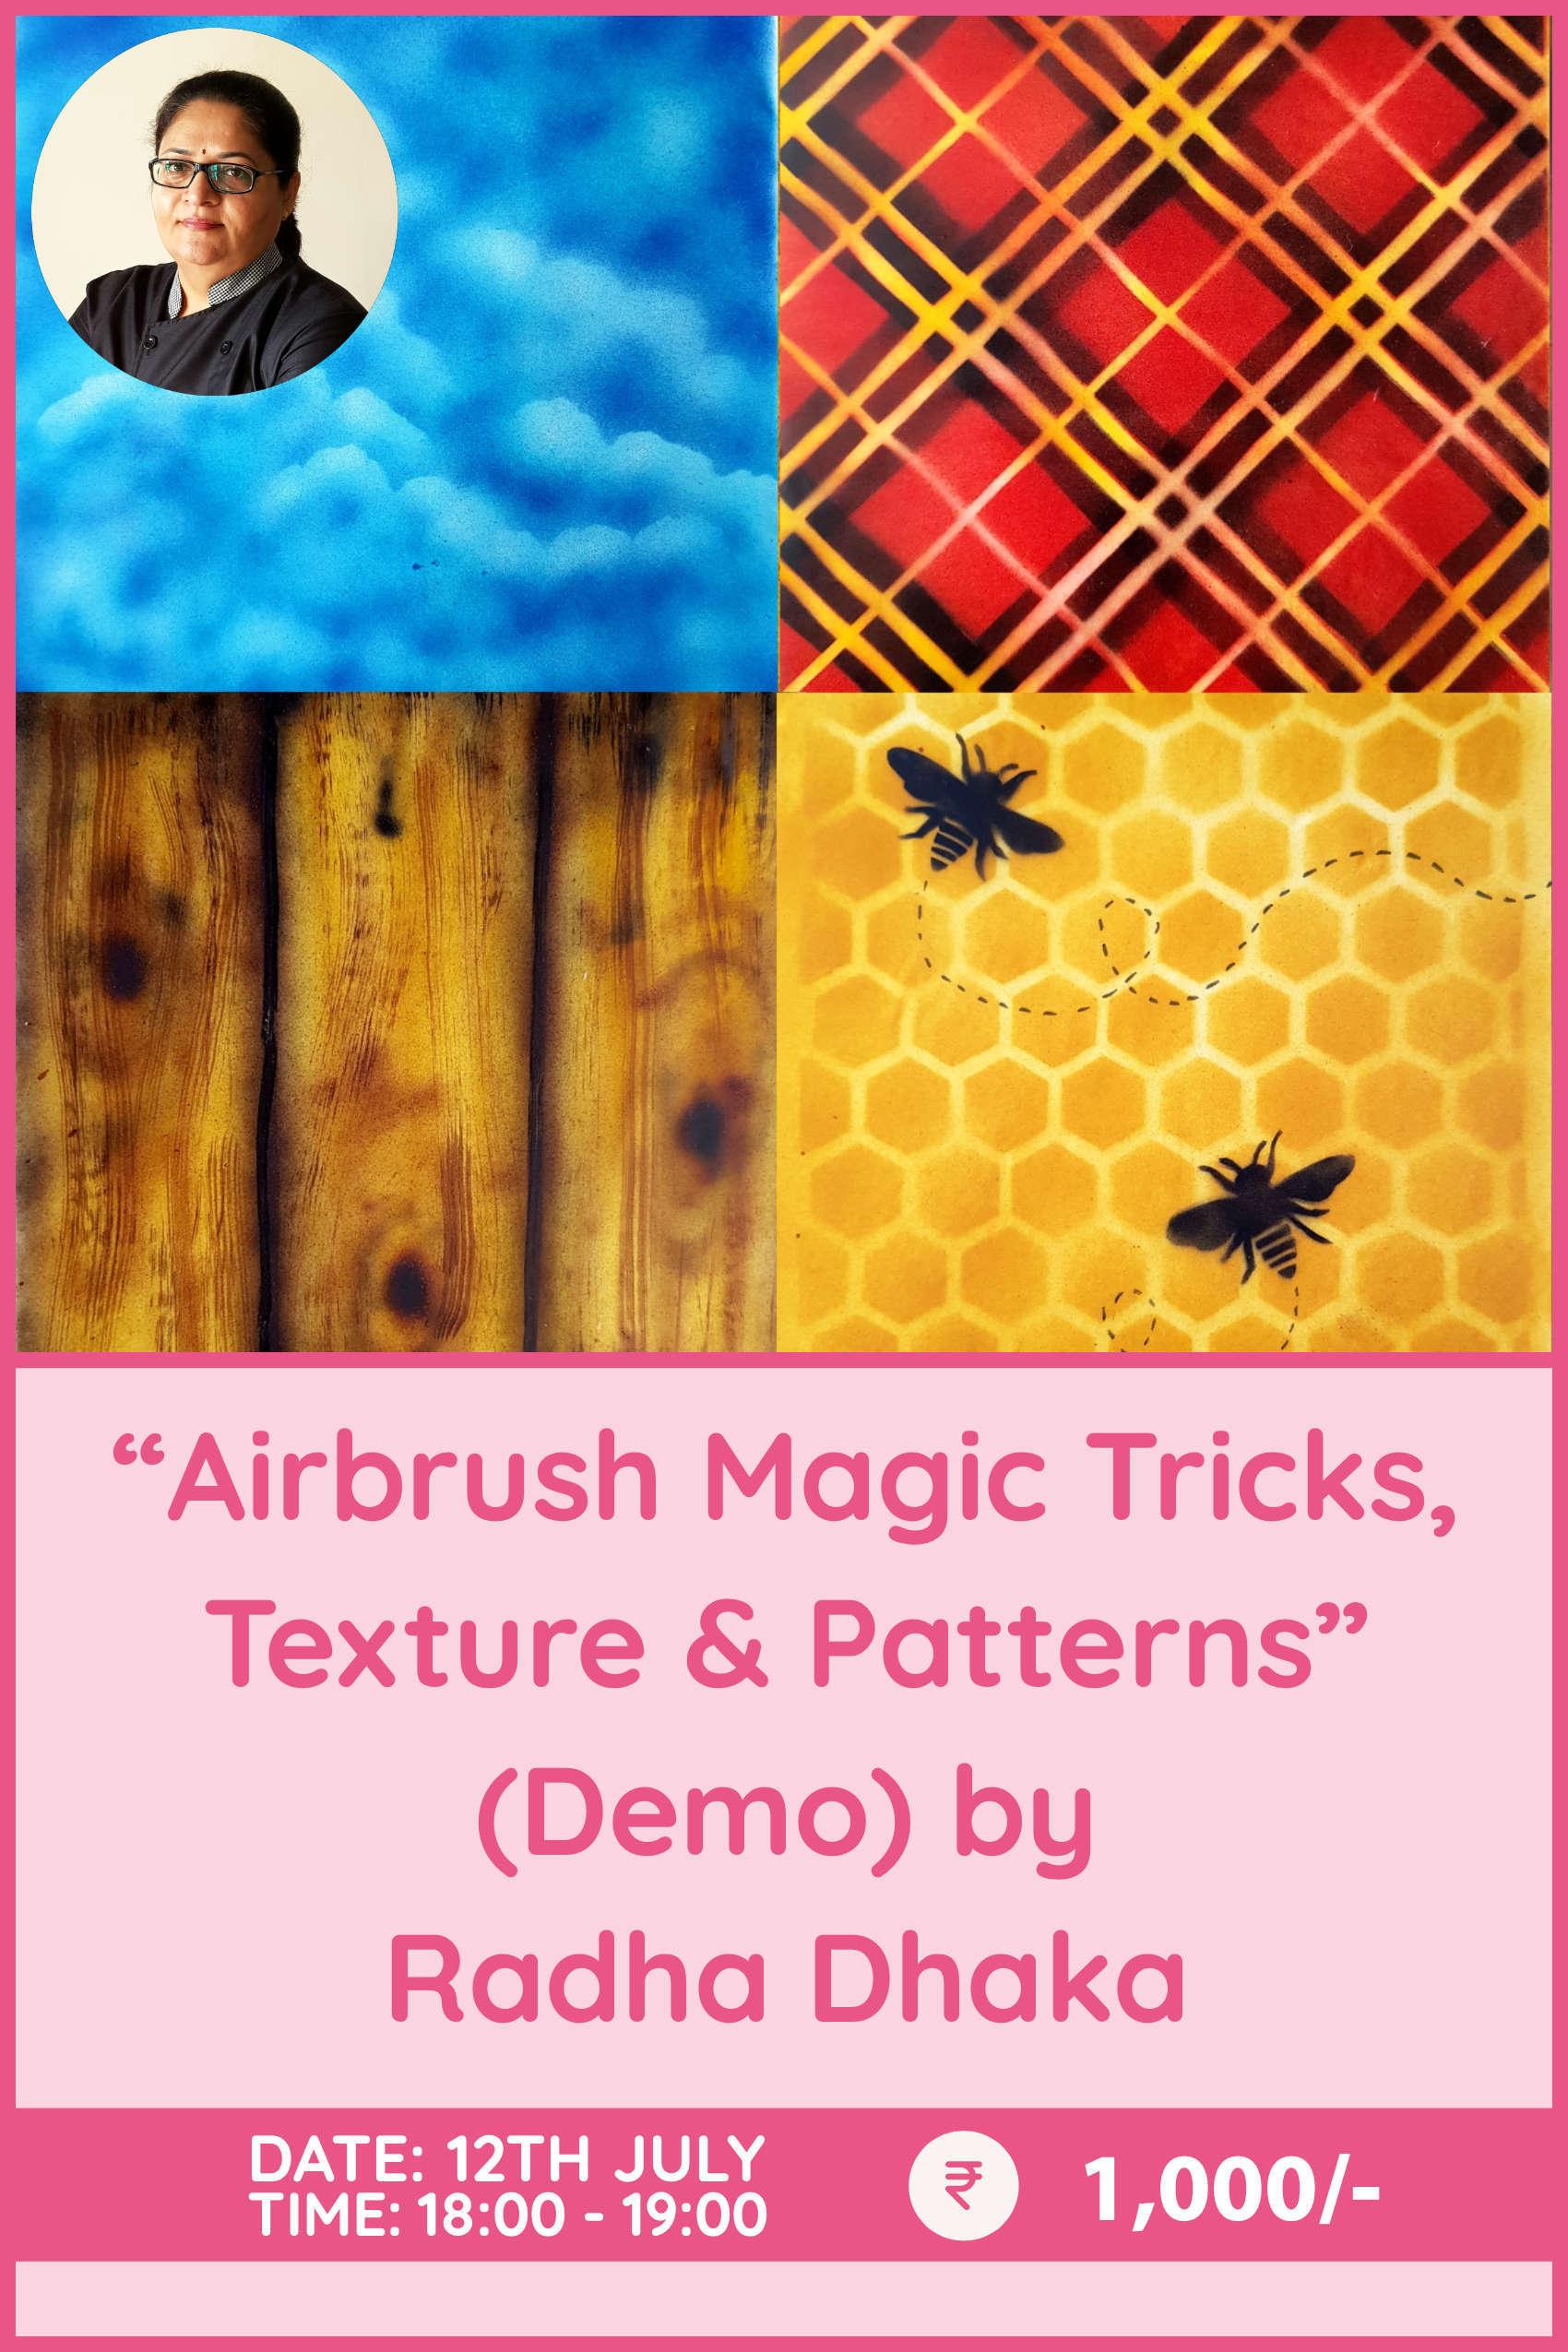 Airbrush Magic Tricks, Textures and Patterns by Radha Dhaka